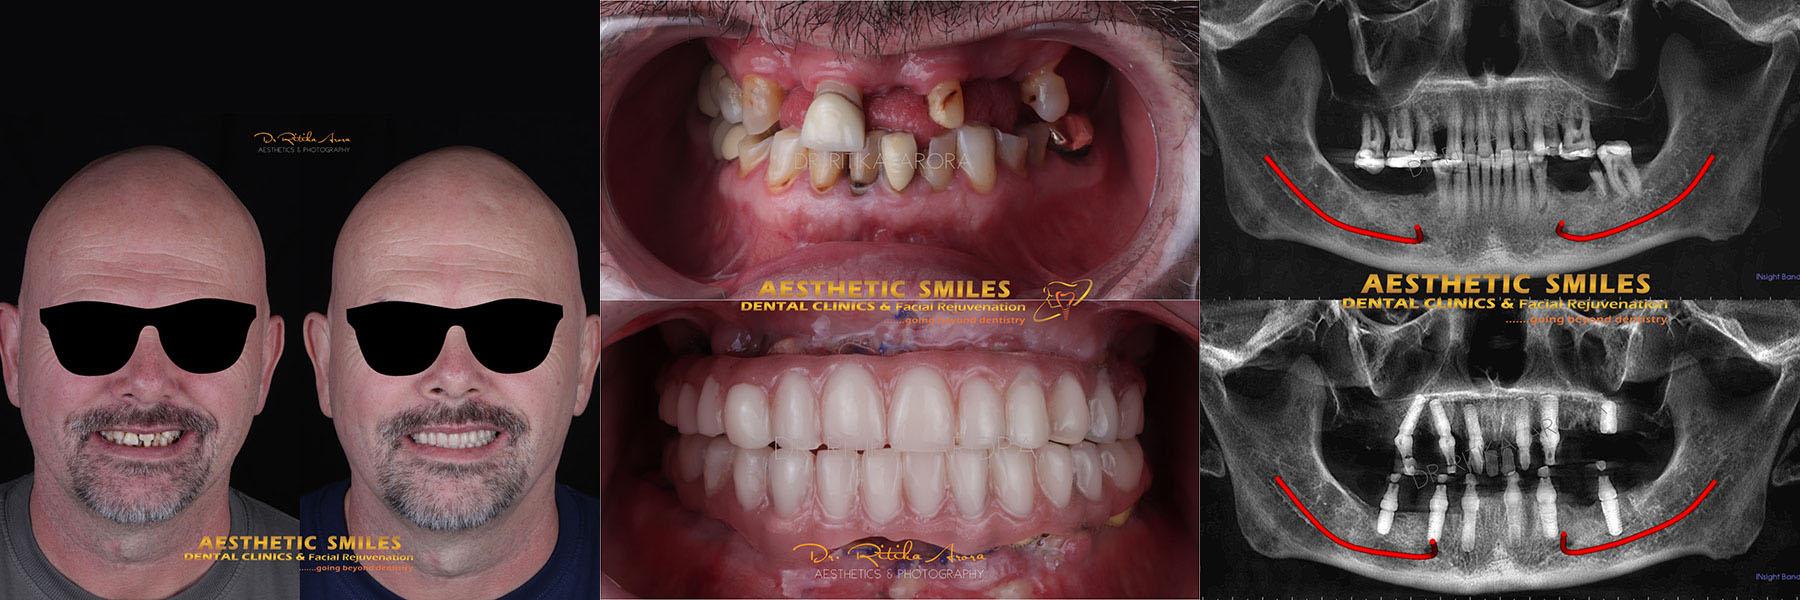 dental implants in mumbai case 1